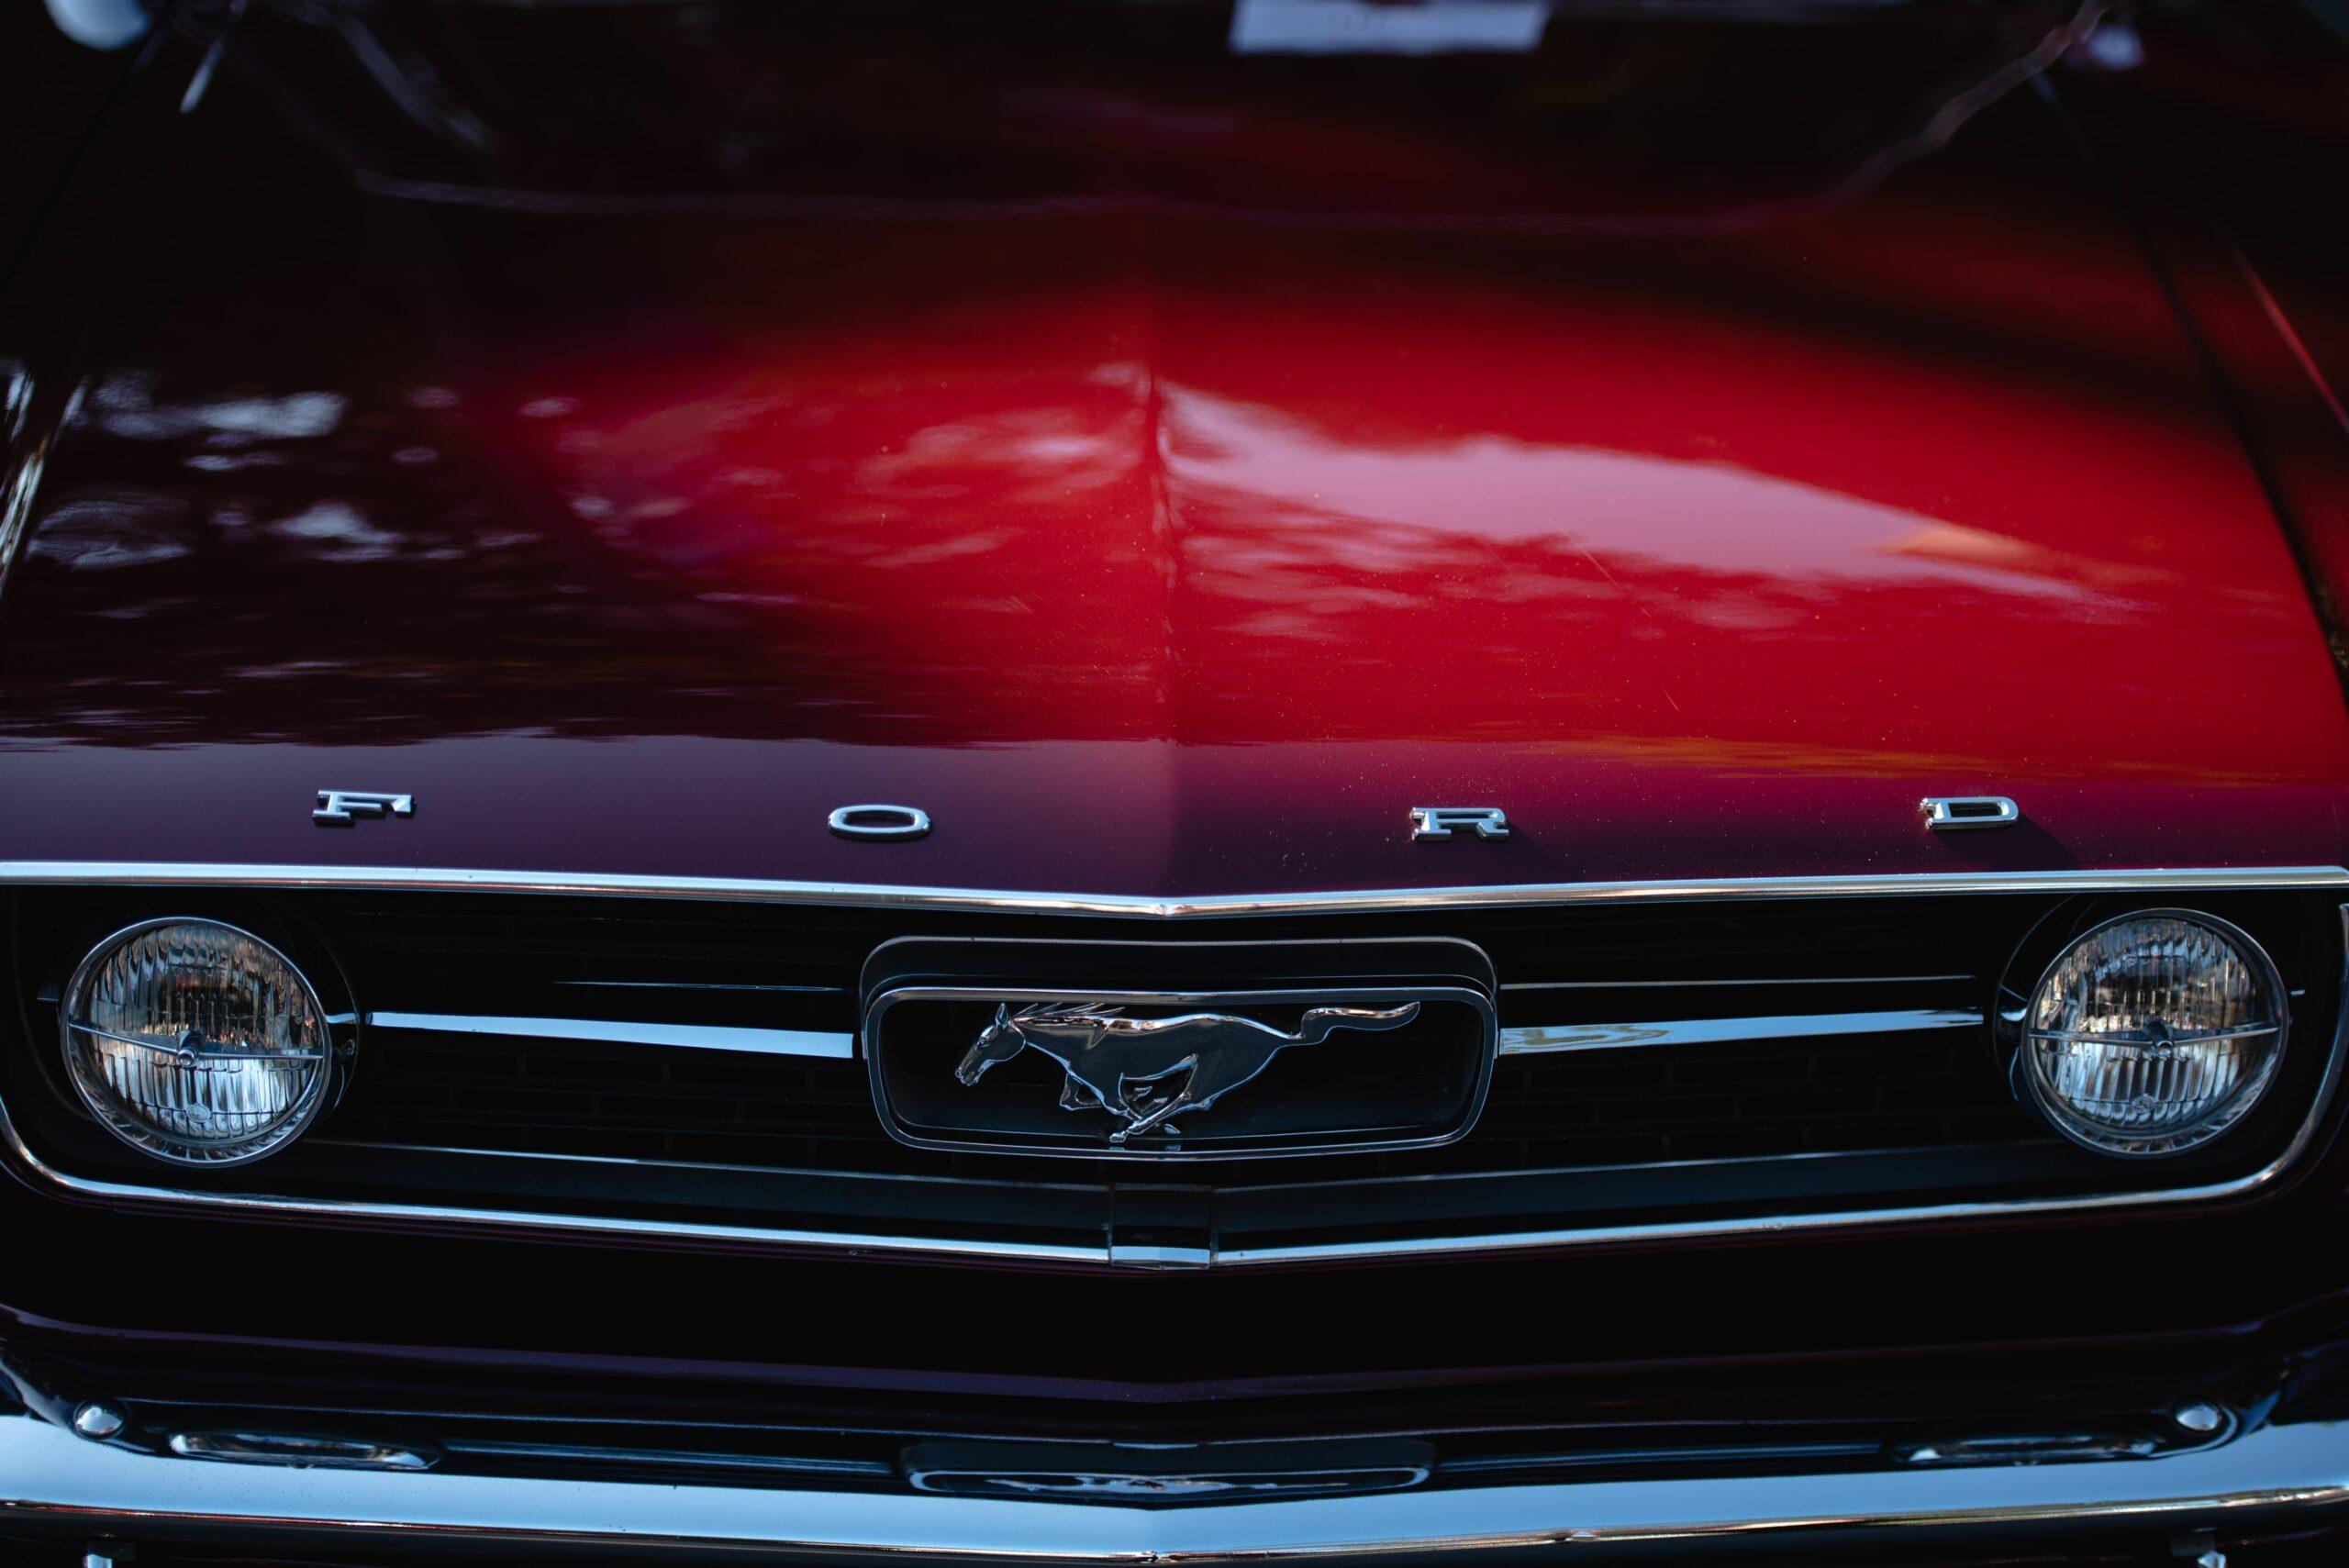 Ford bude do roku 2030 vyrábět v Evropě pouze elektromobily